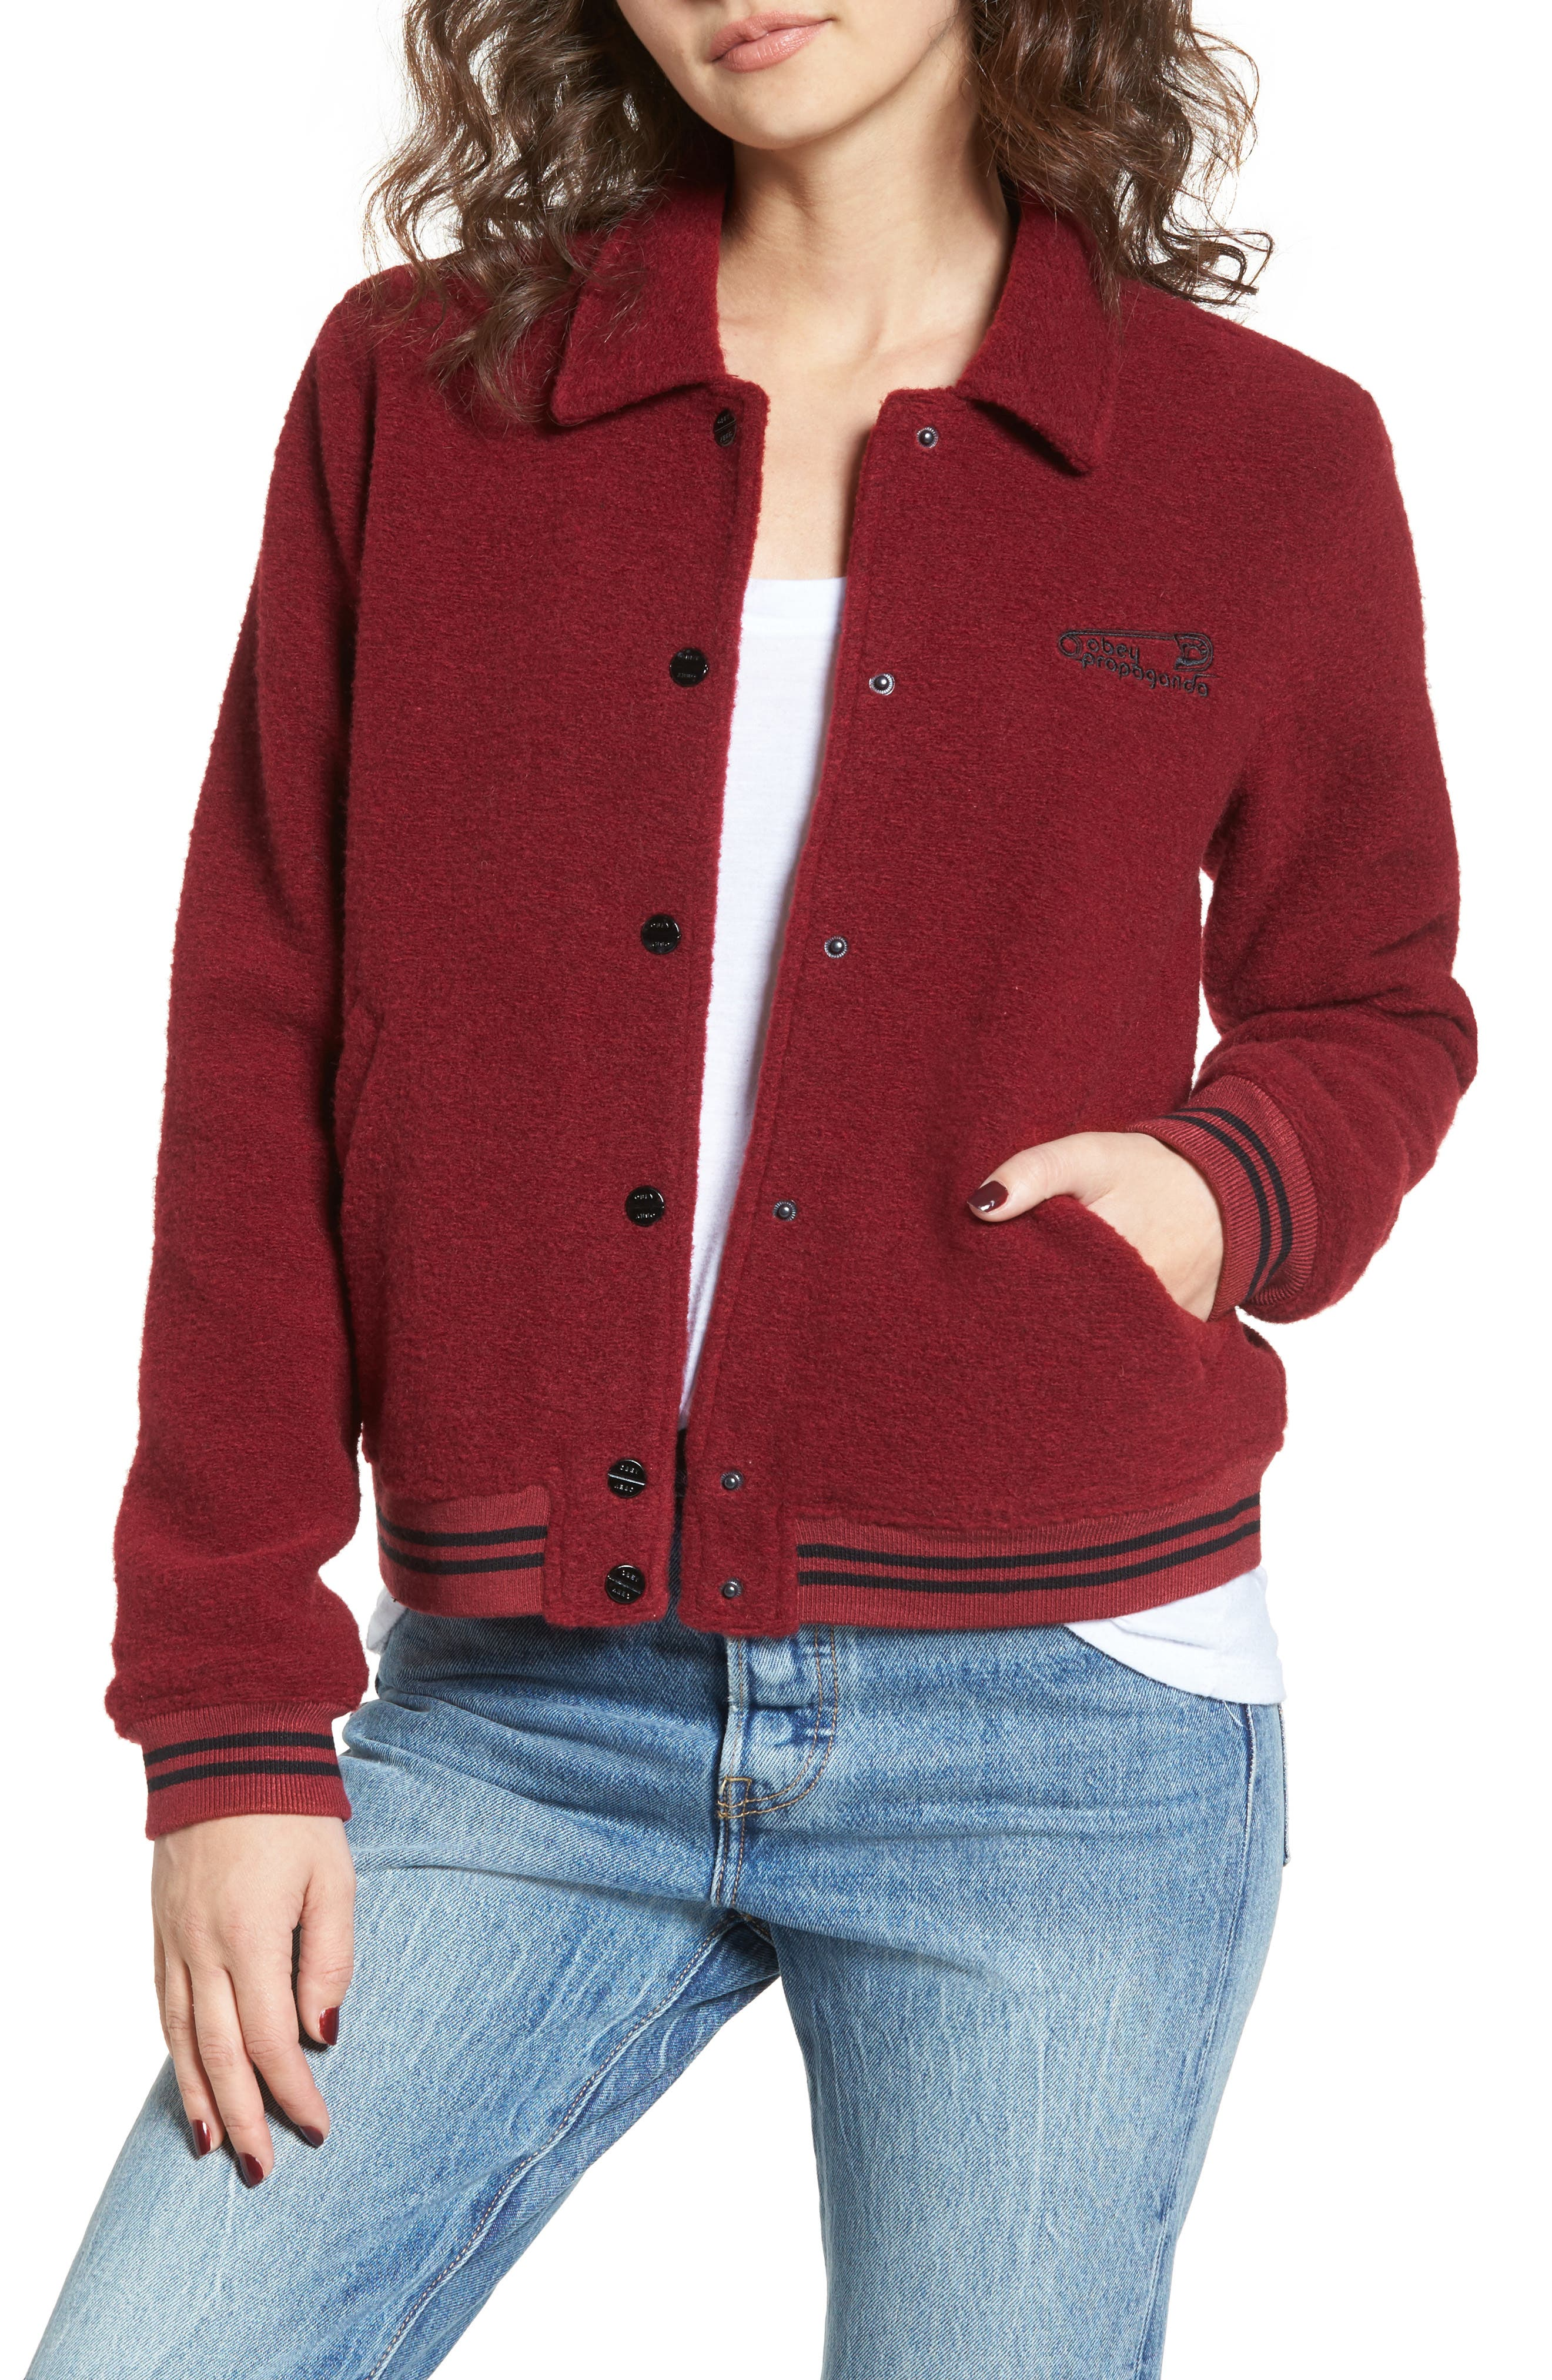 Alternate Image 1 Selected - Obey Cambridge Jacket